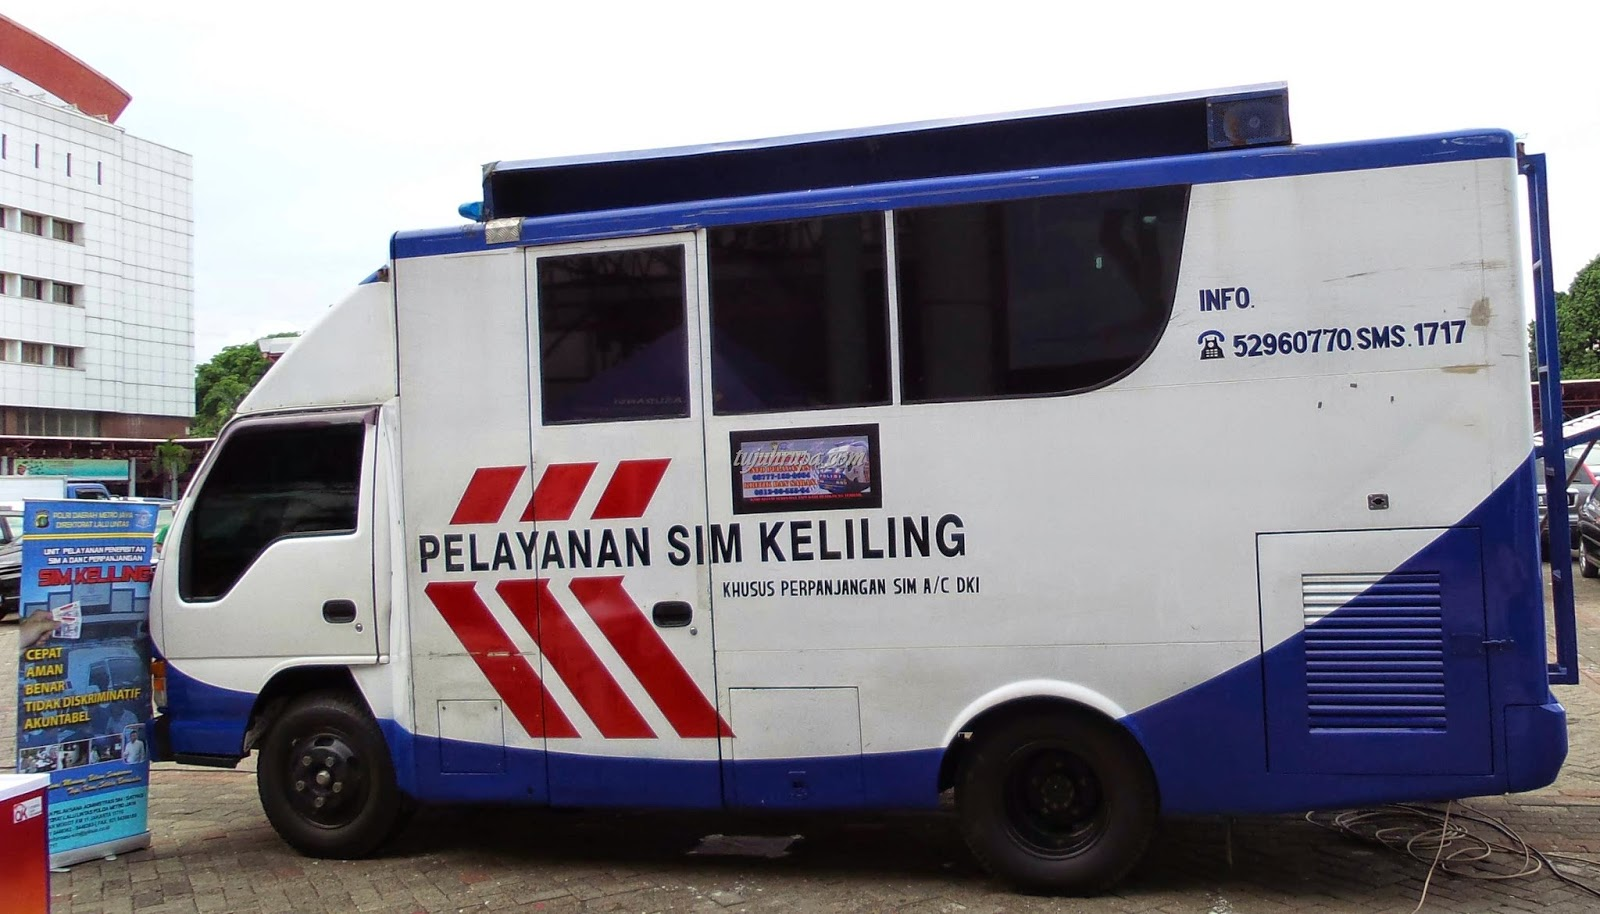 Ini 5 Tempat Pelayanan SIM Keliling di Jakarta